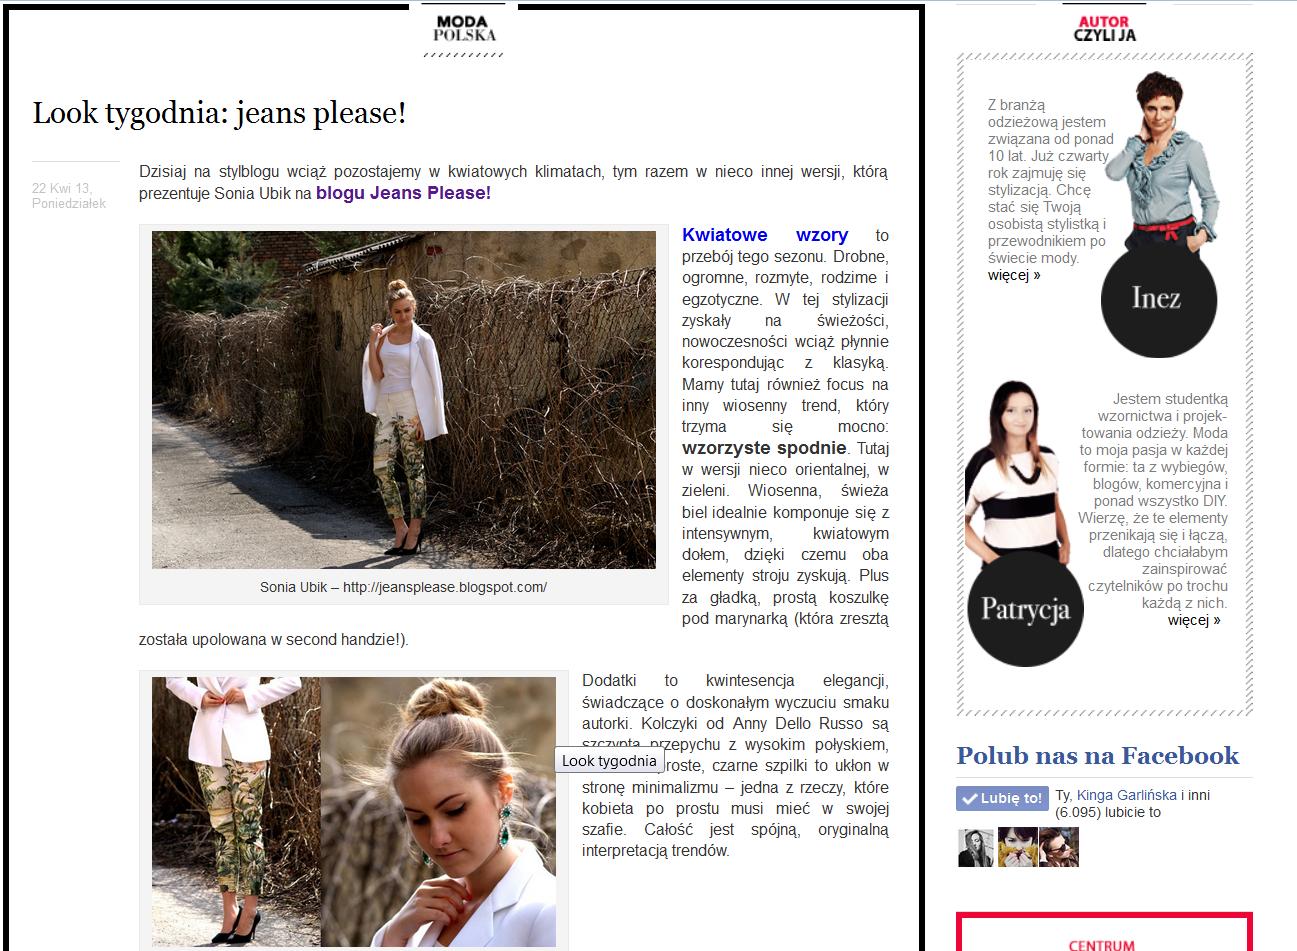 http://stylblog.pl/3408/look-tygodnia-jeans-please/